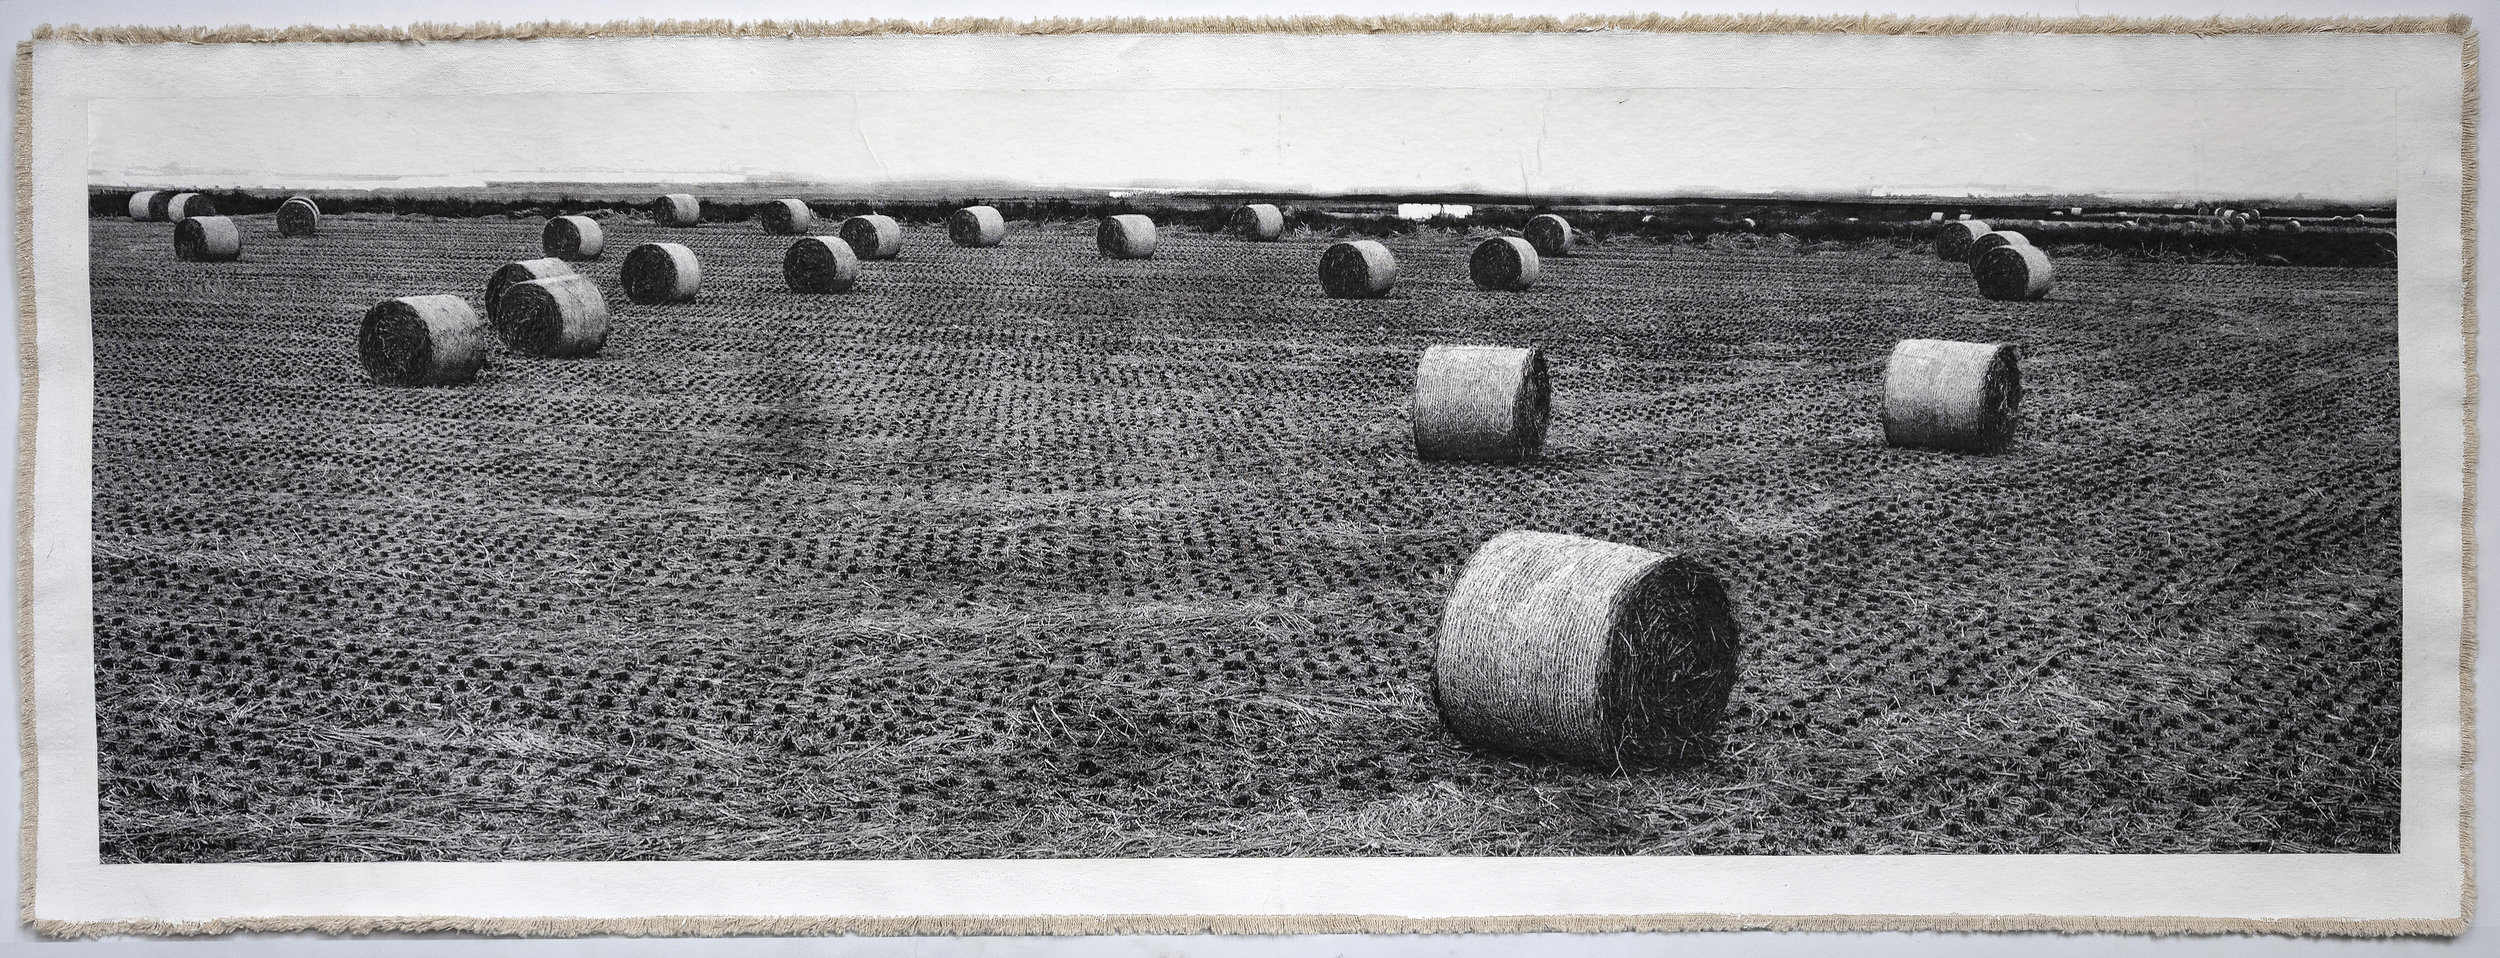 Rice Field Aso, IV